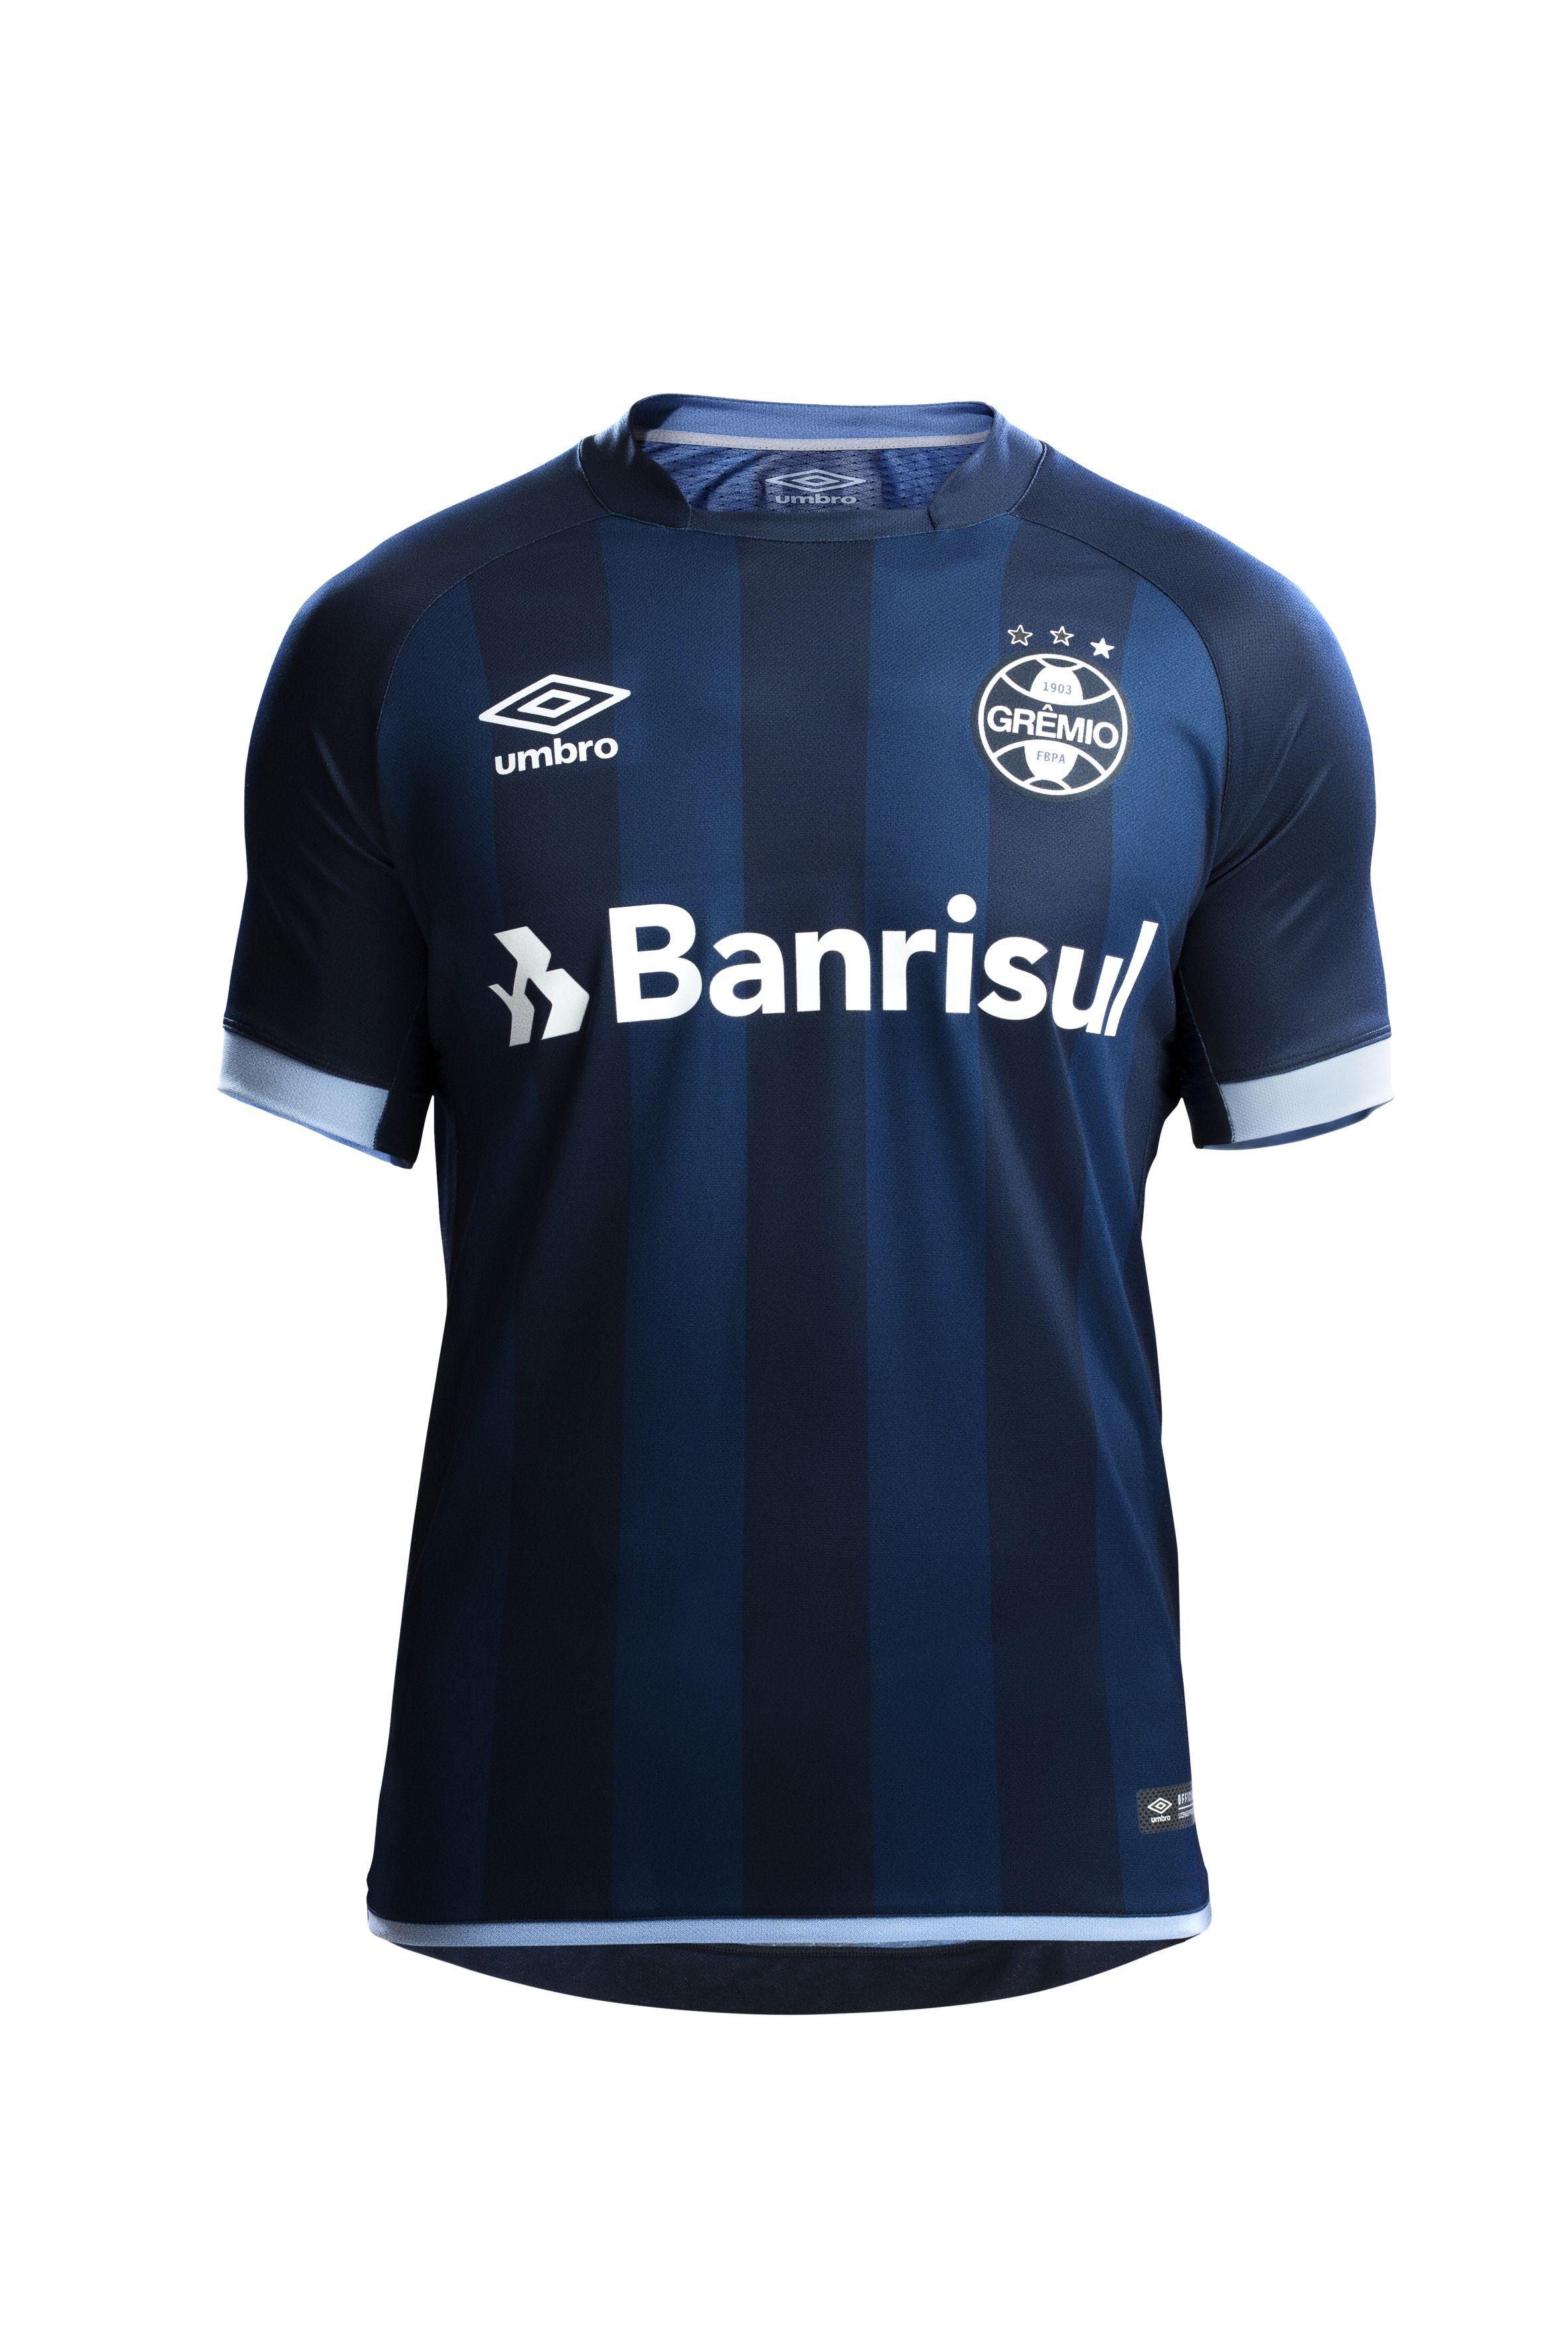 Grêmio apresenta nova camisa 3 d334739c71560